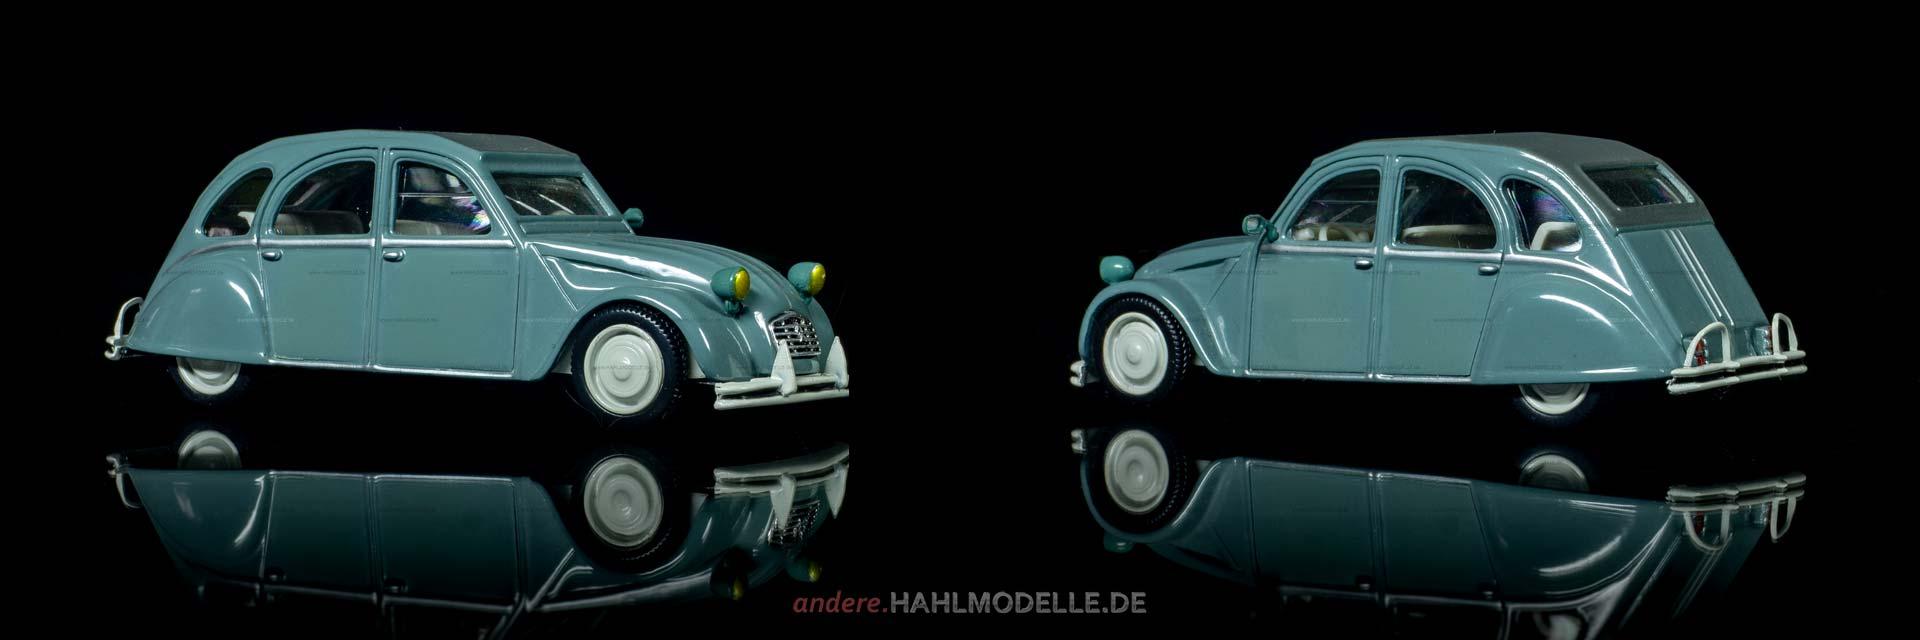 Citroën 2 CV | Limousine | Ixo | www.andere.hahlmodelle.de